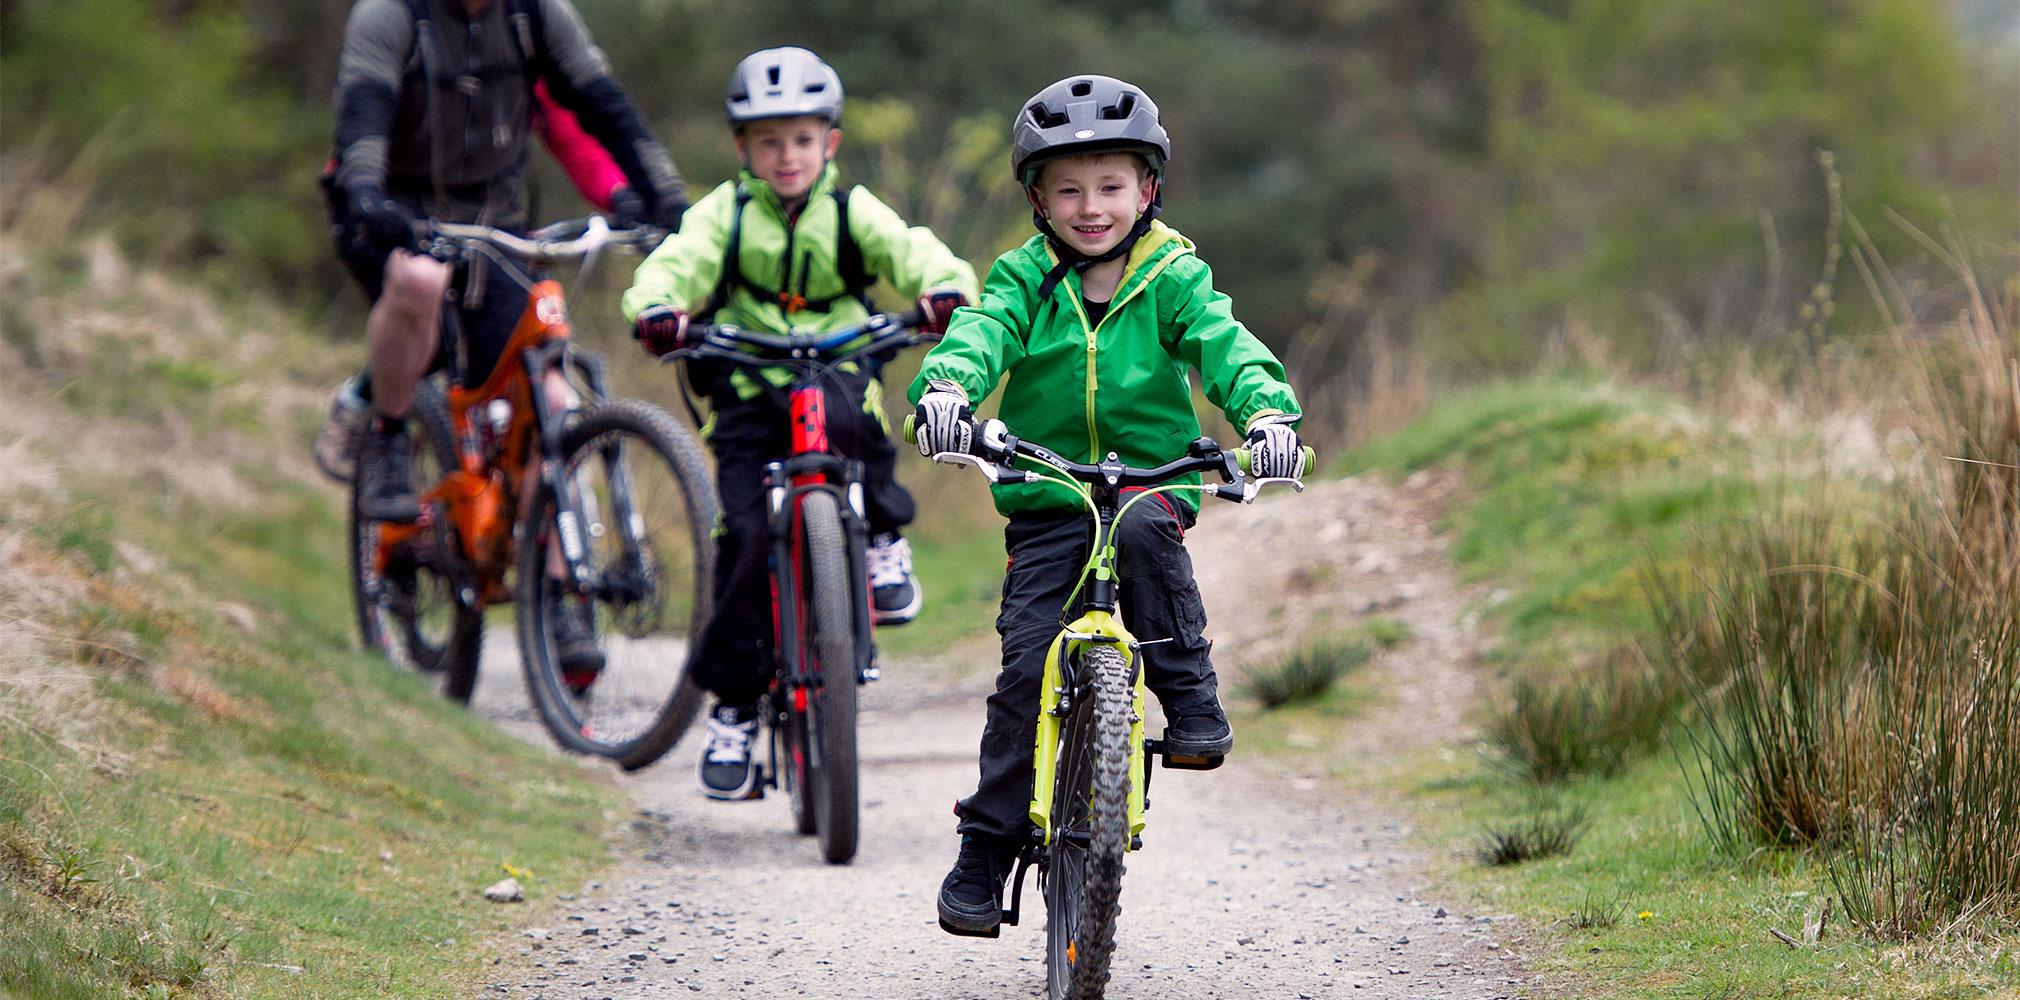 Aikwood-Mountain-Biking-2-C.jpg